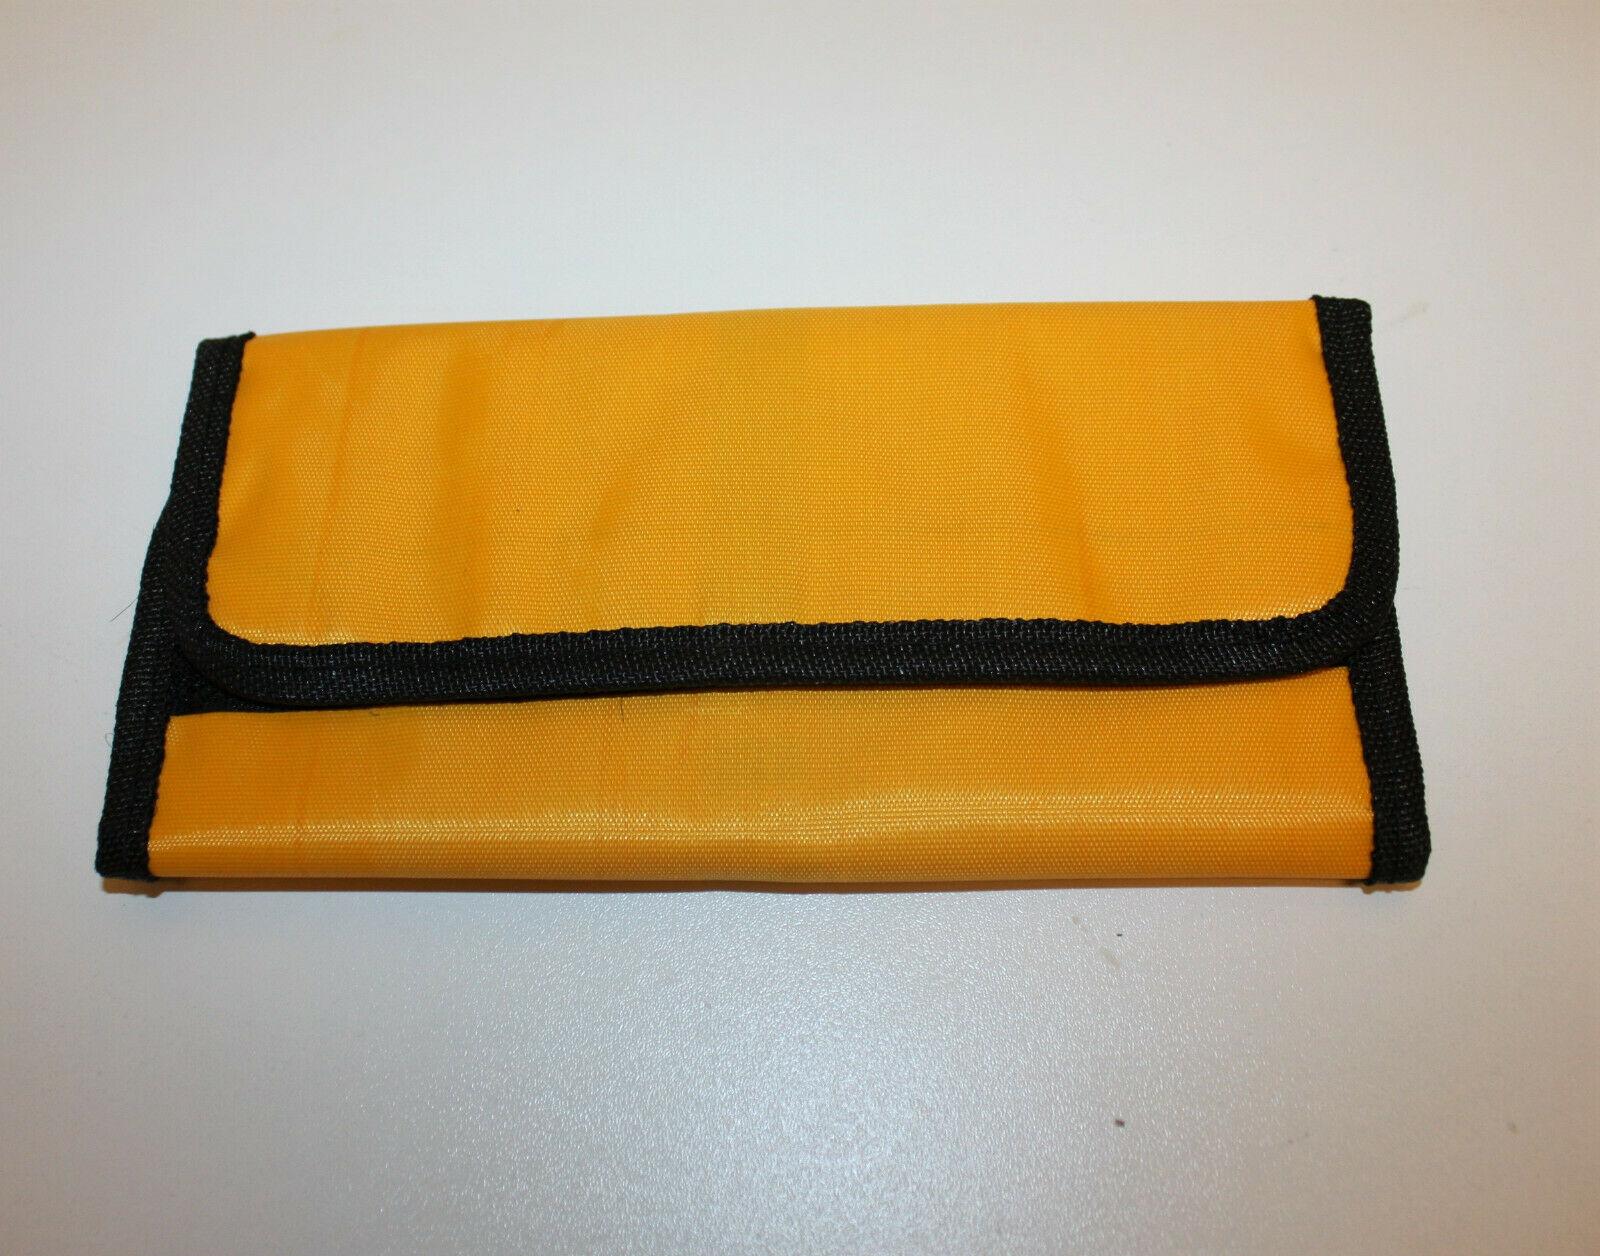 Instrumenten Etui (orange)